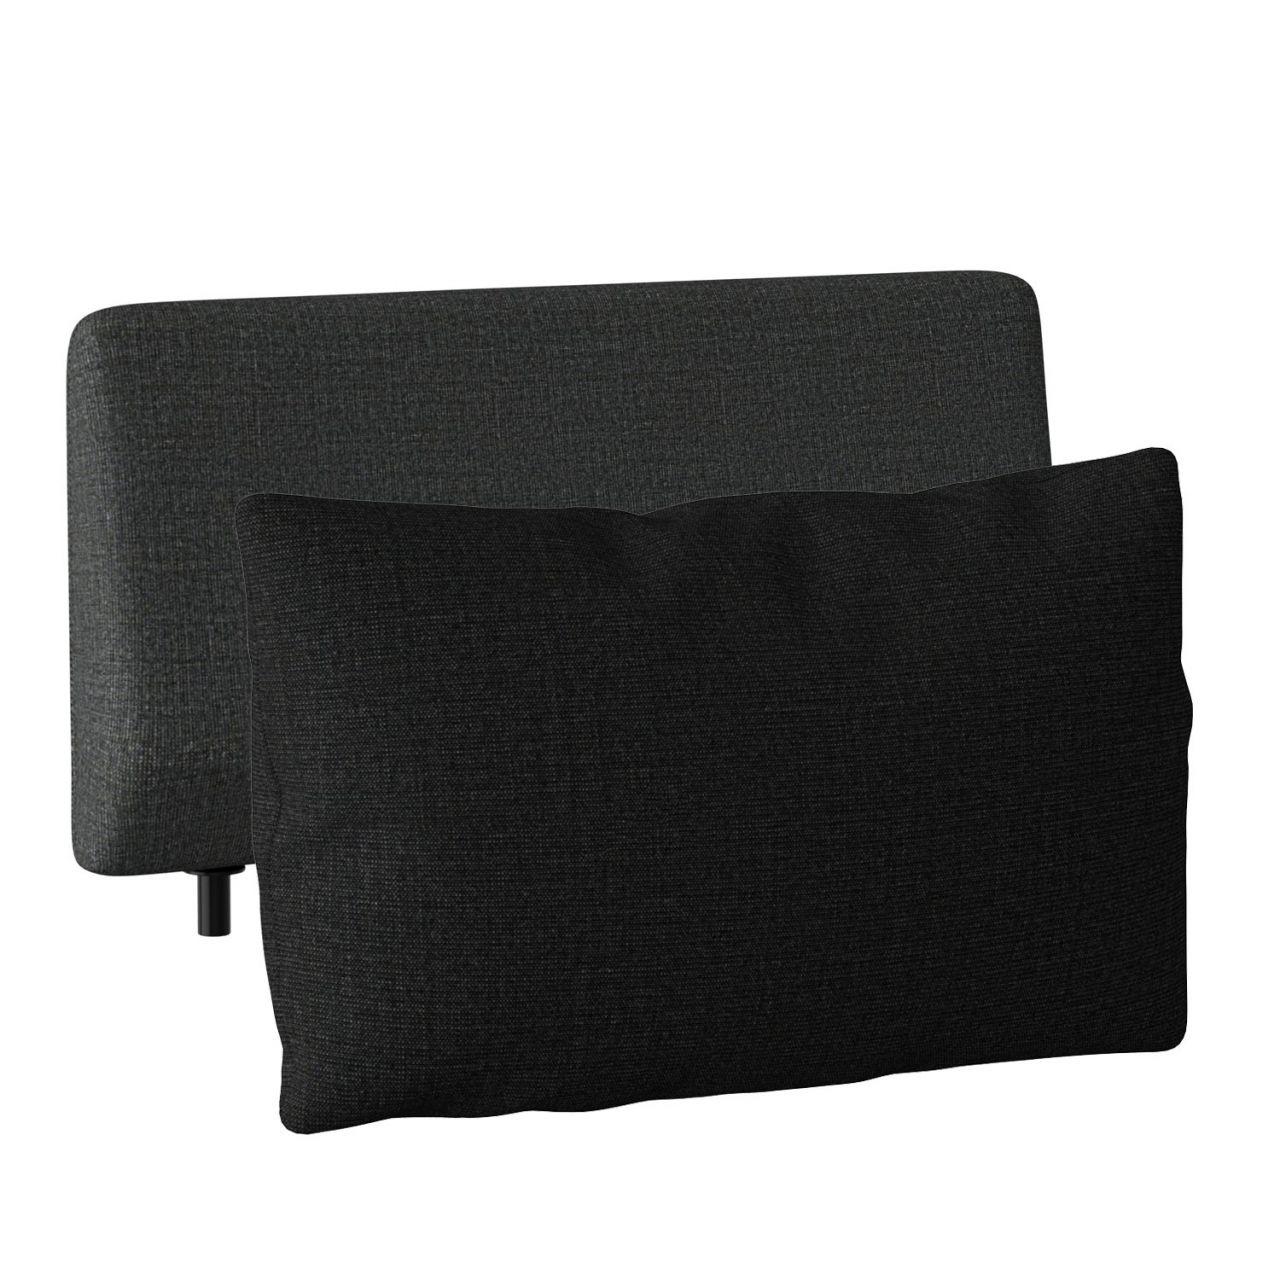 UMAGE - Lean Back Kopfstütze mit Kissen 5405